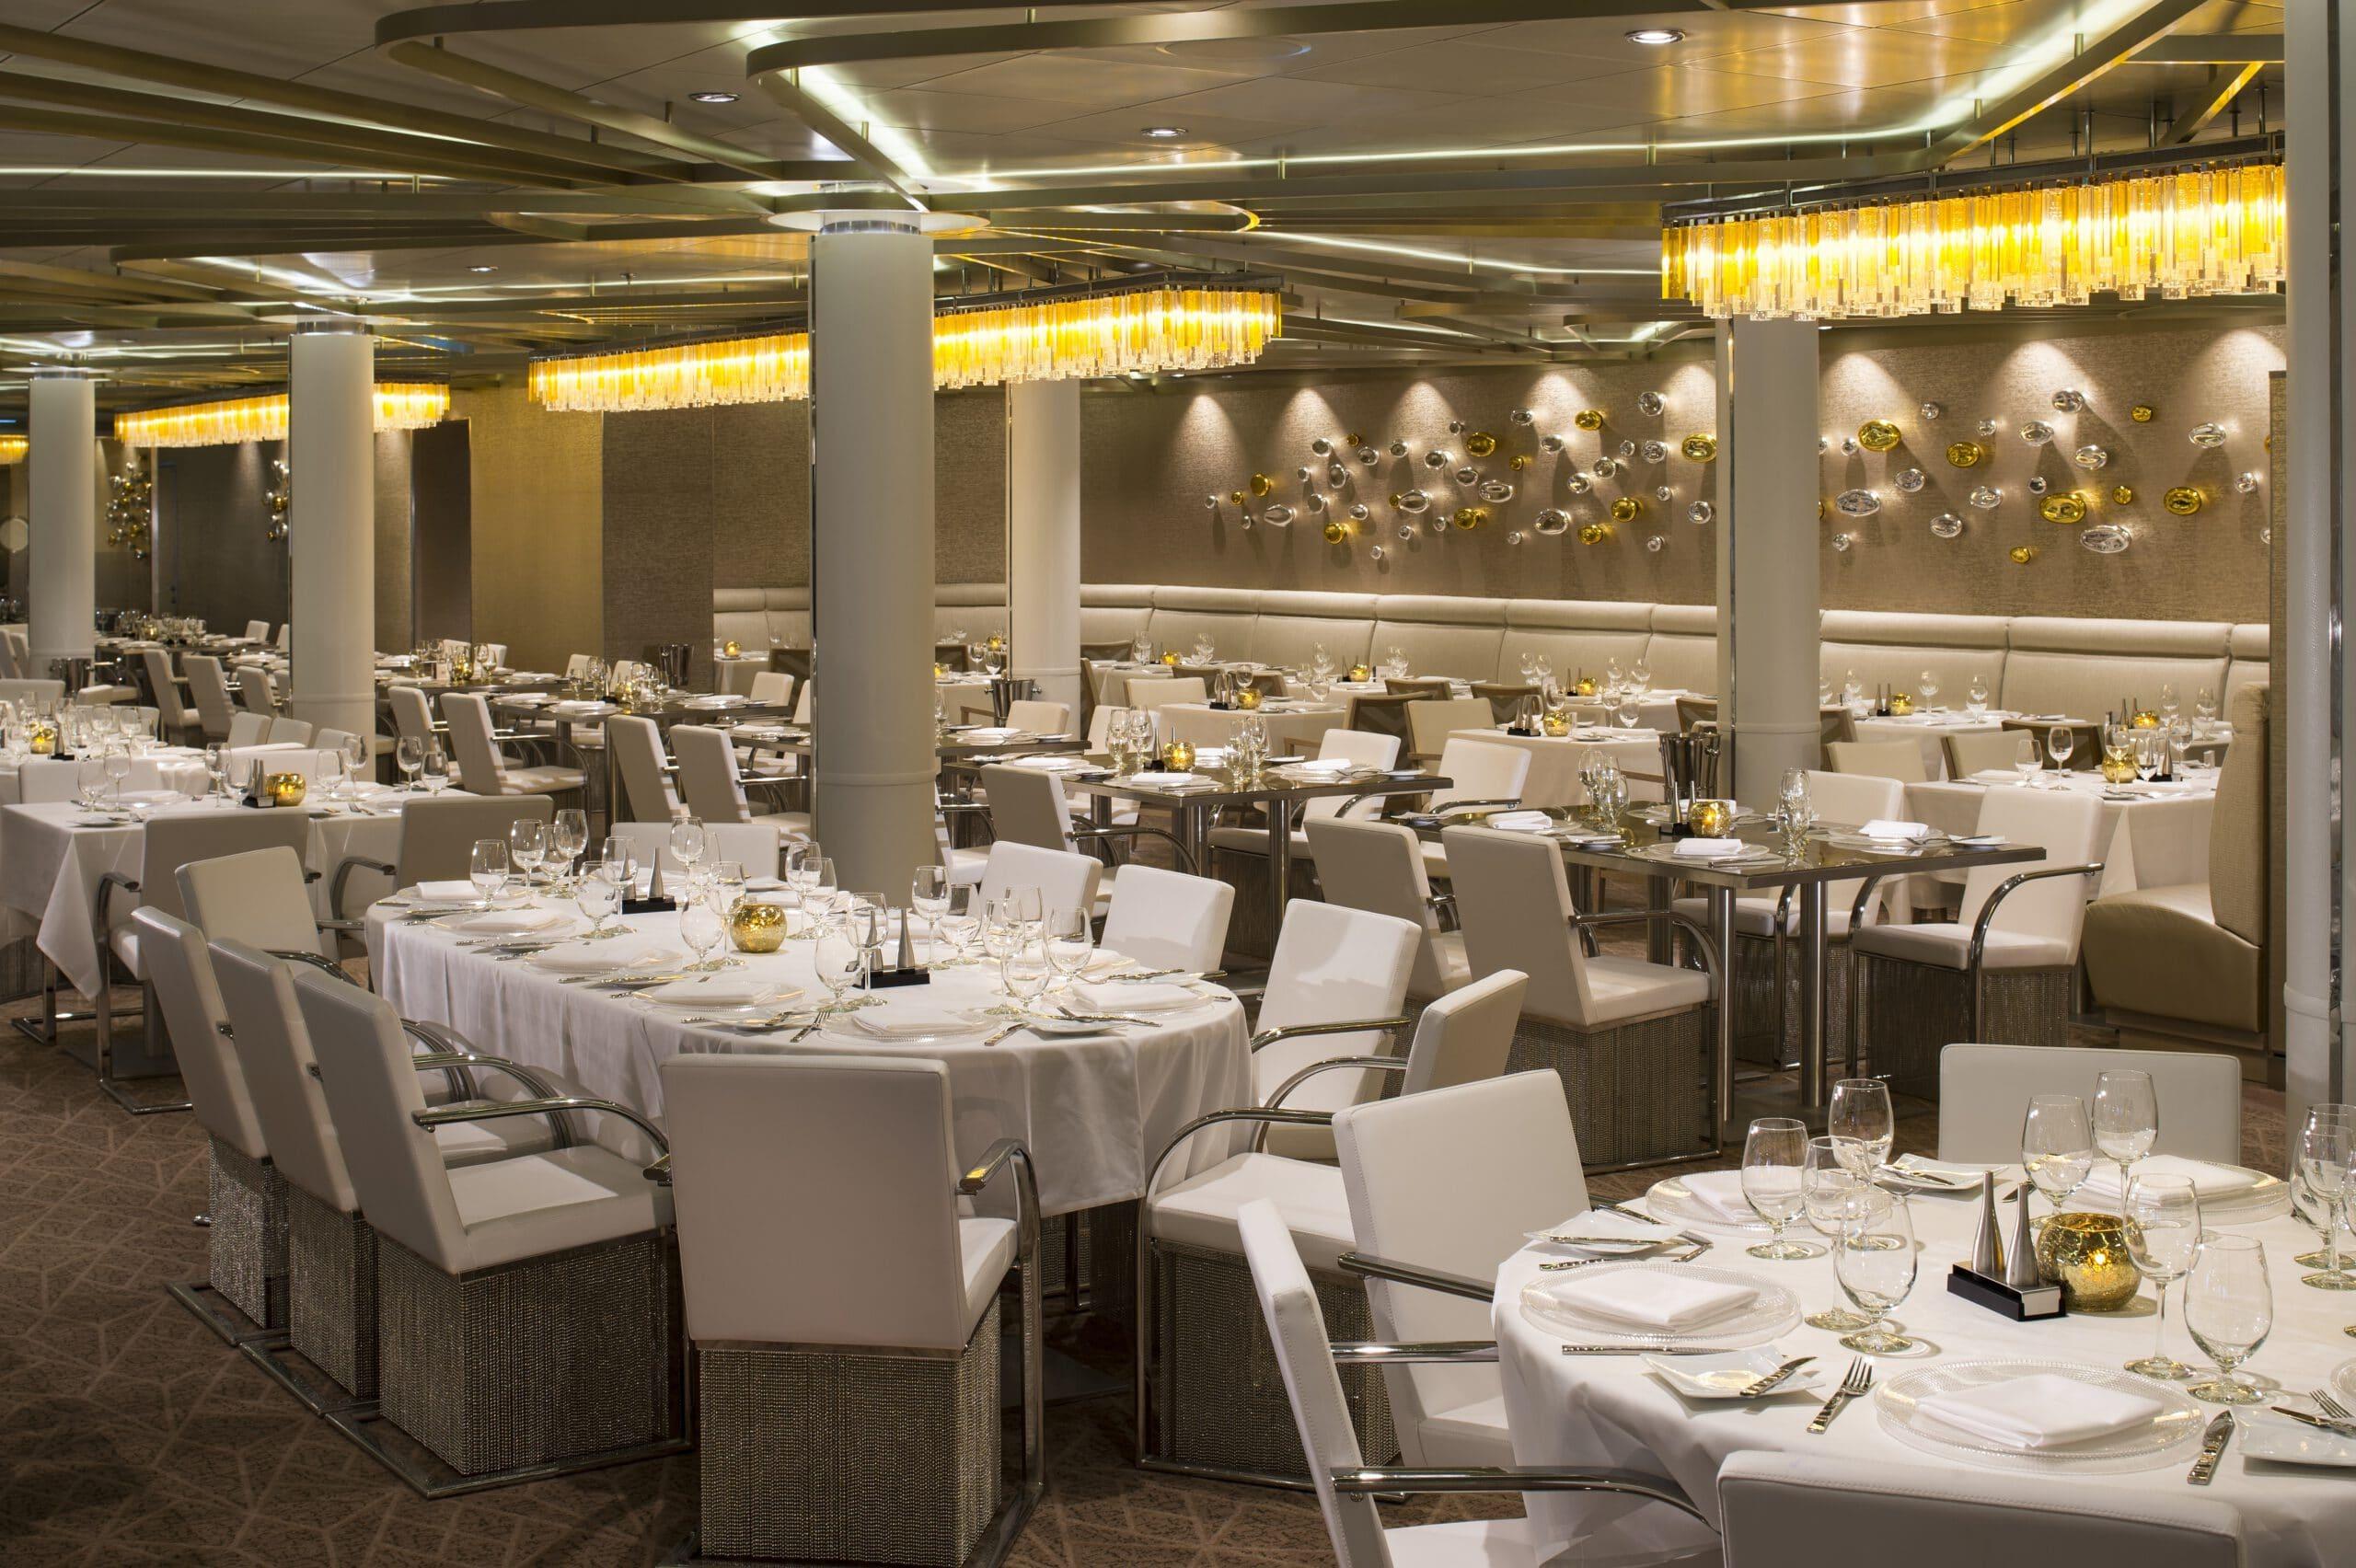 Cruiseschip-Odyssey of the Seas-Ovation of the Seas-Quantum of the Seas-Spectrum of the Seas-Royal Caribbean International-Restaurant Chic